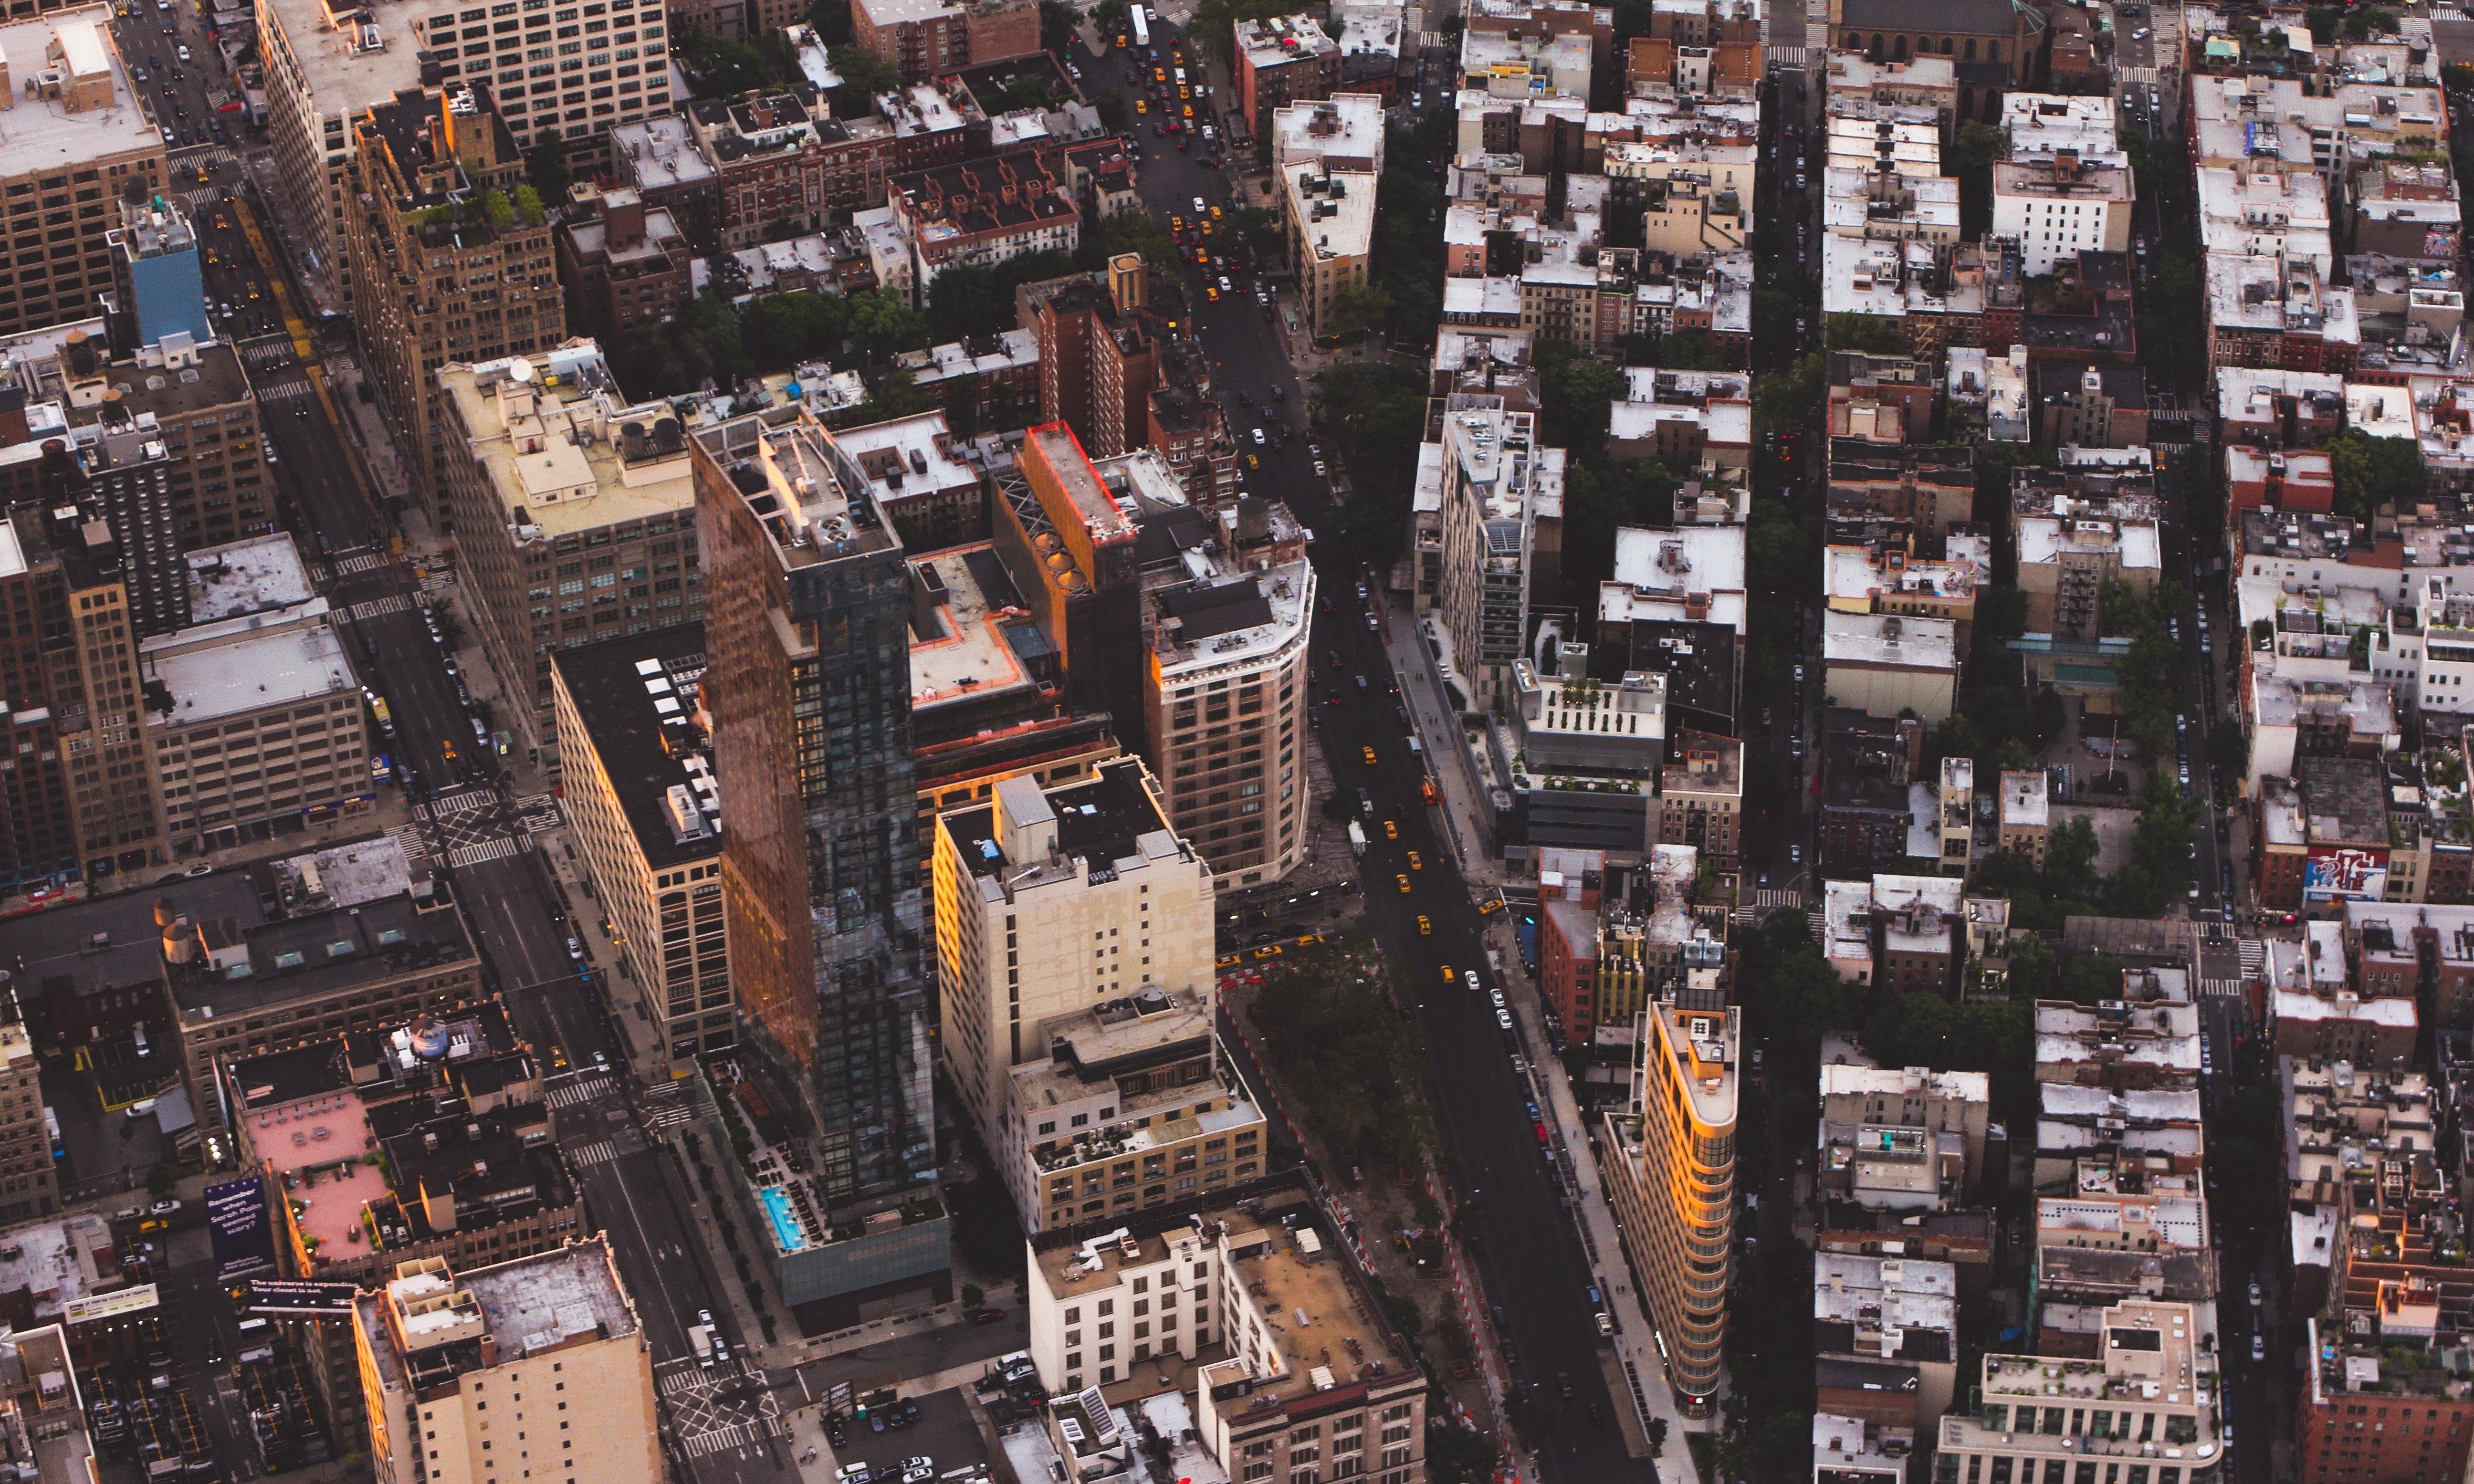 State of Cities Reducing Povert